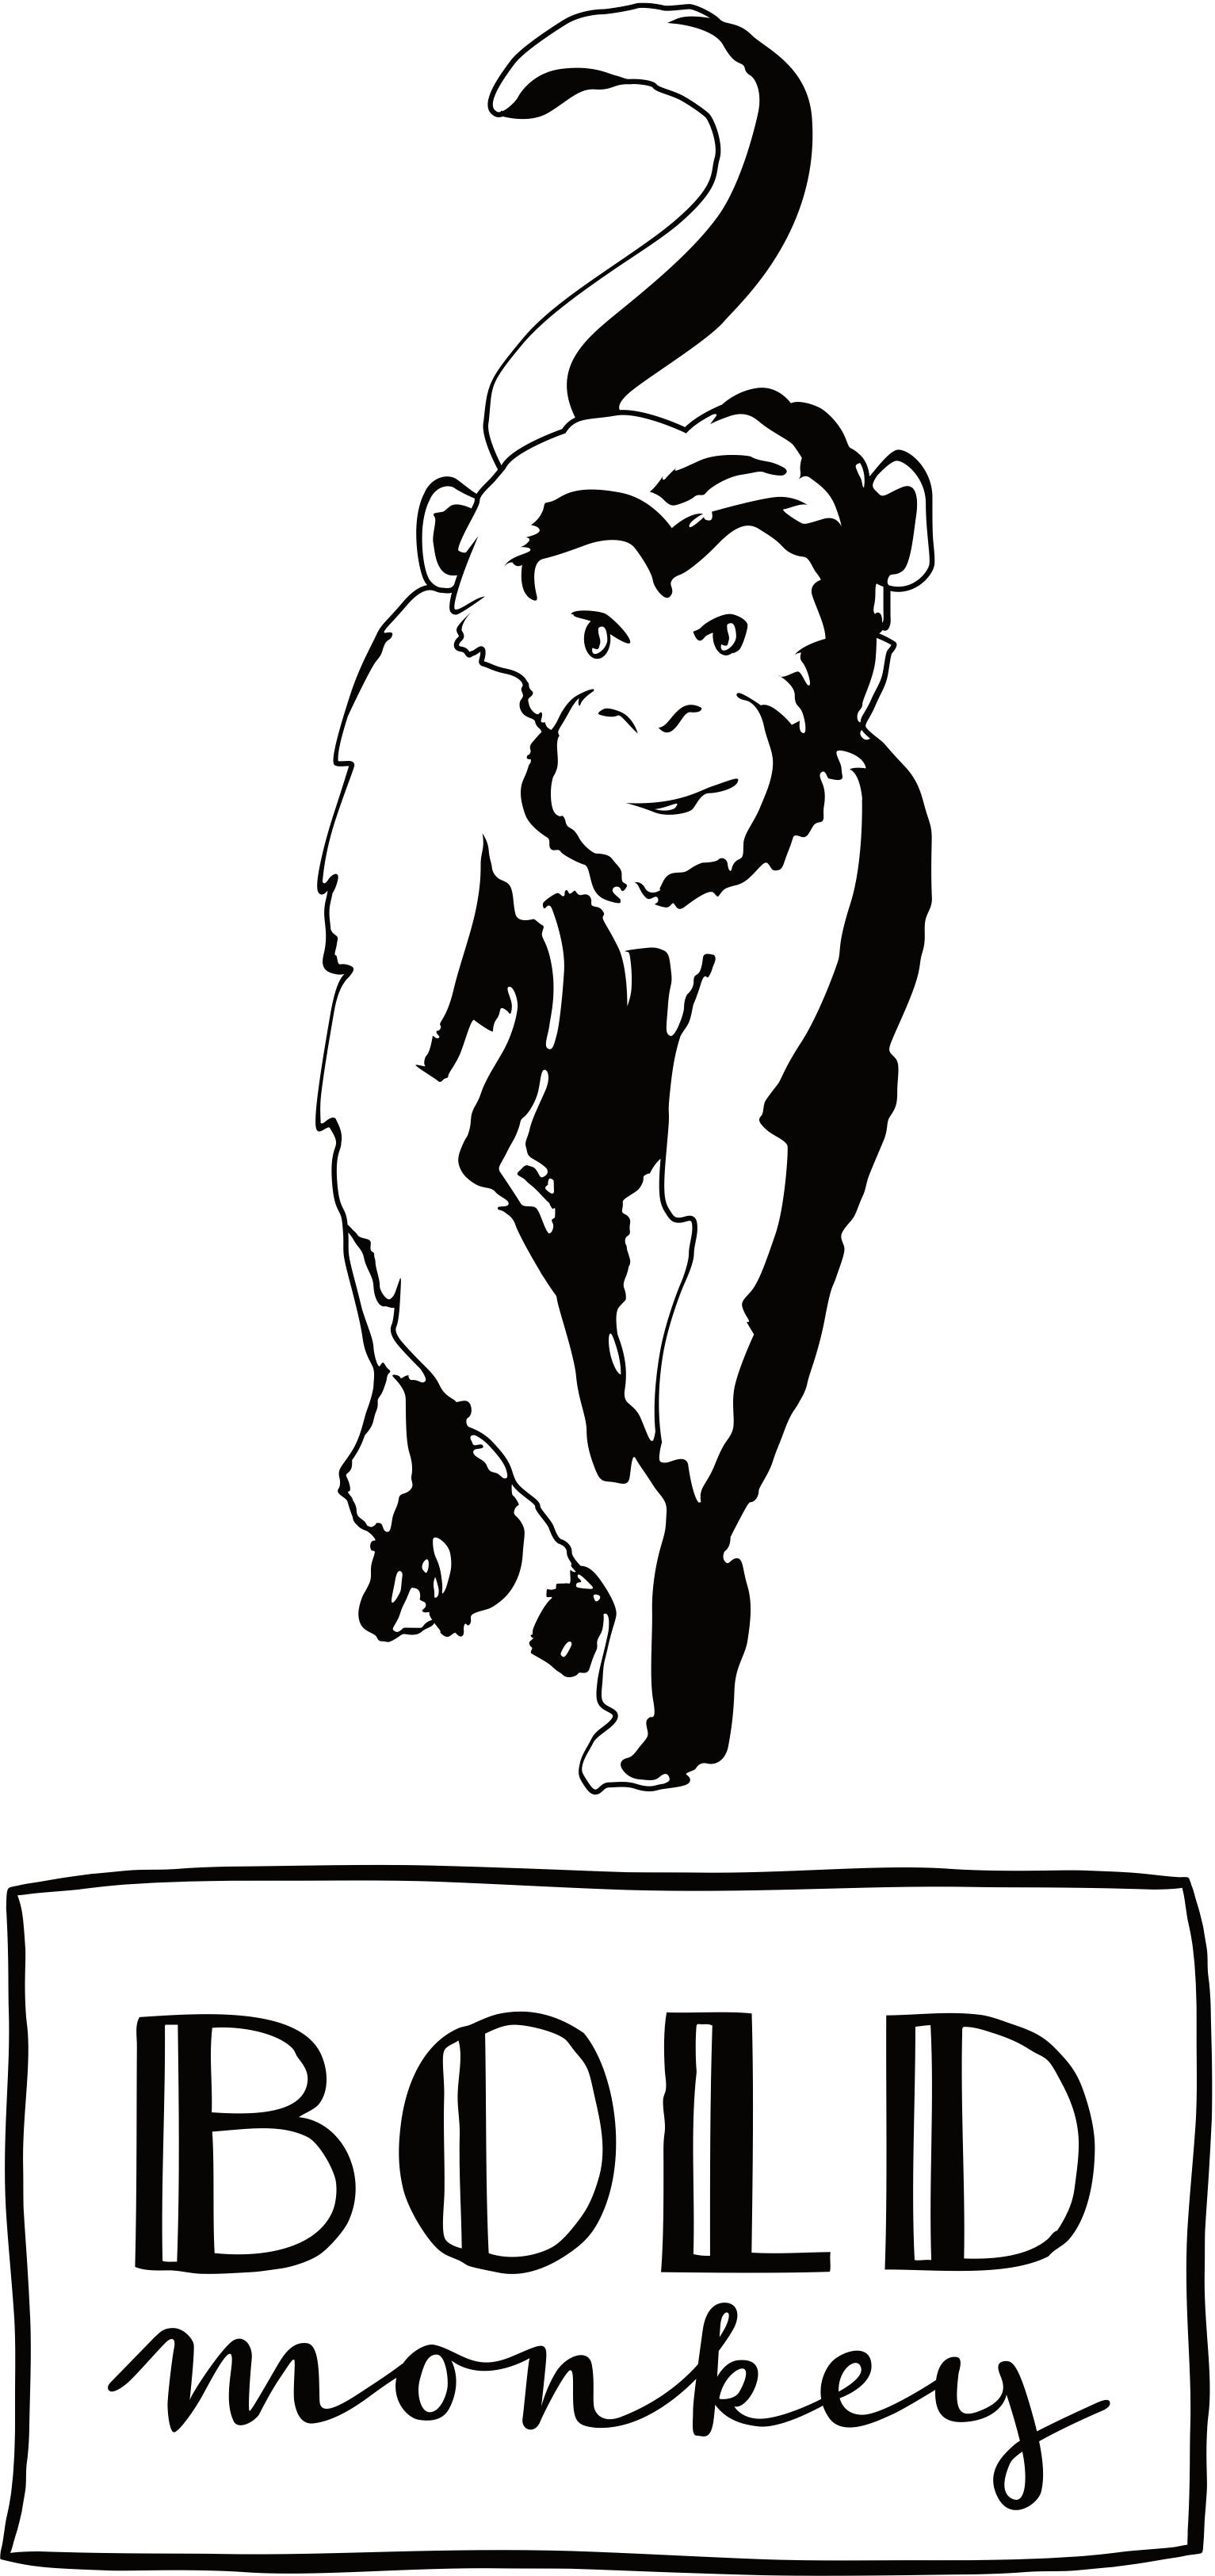 bold monkey Devilish Bulldog deco light oranje